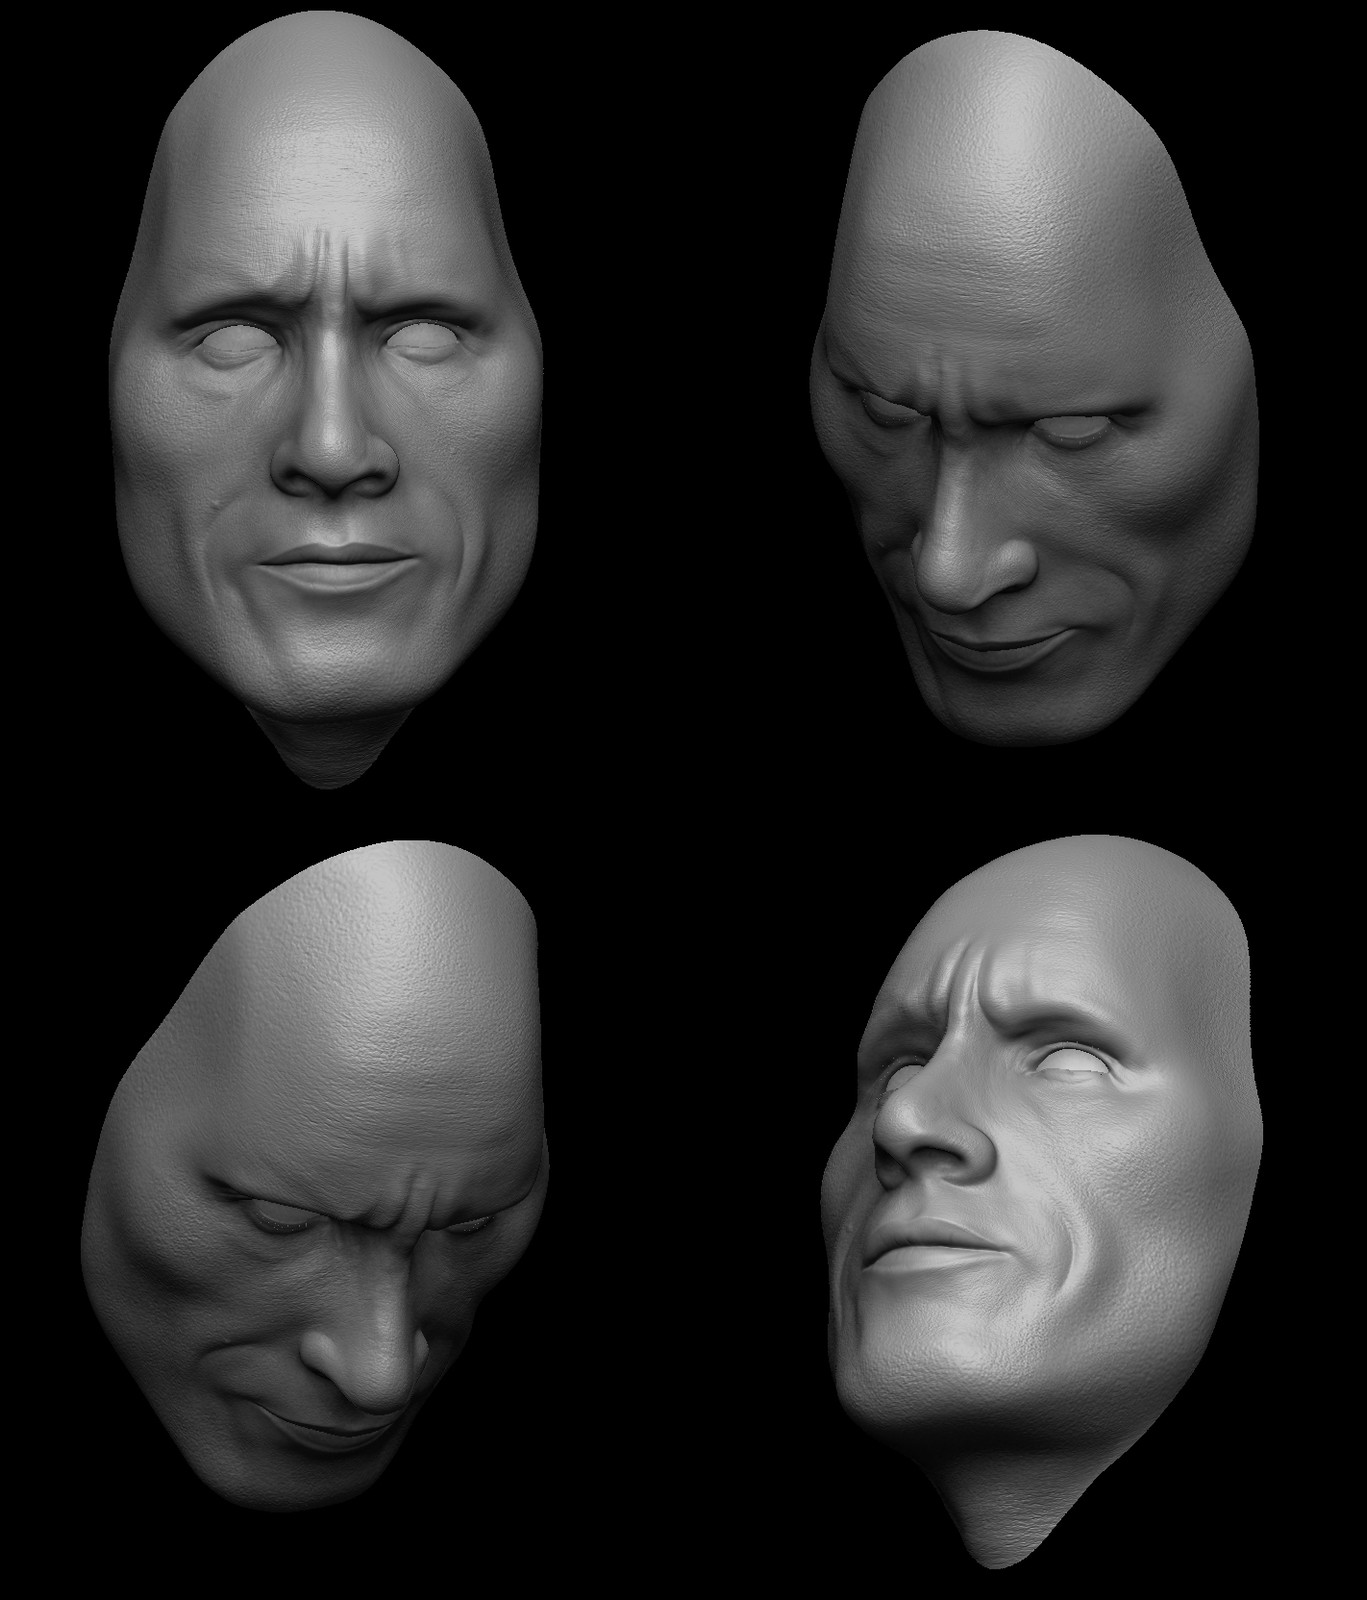 Dwayne Johnson_3D Porttrait by Surajit Sen